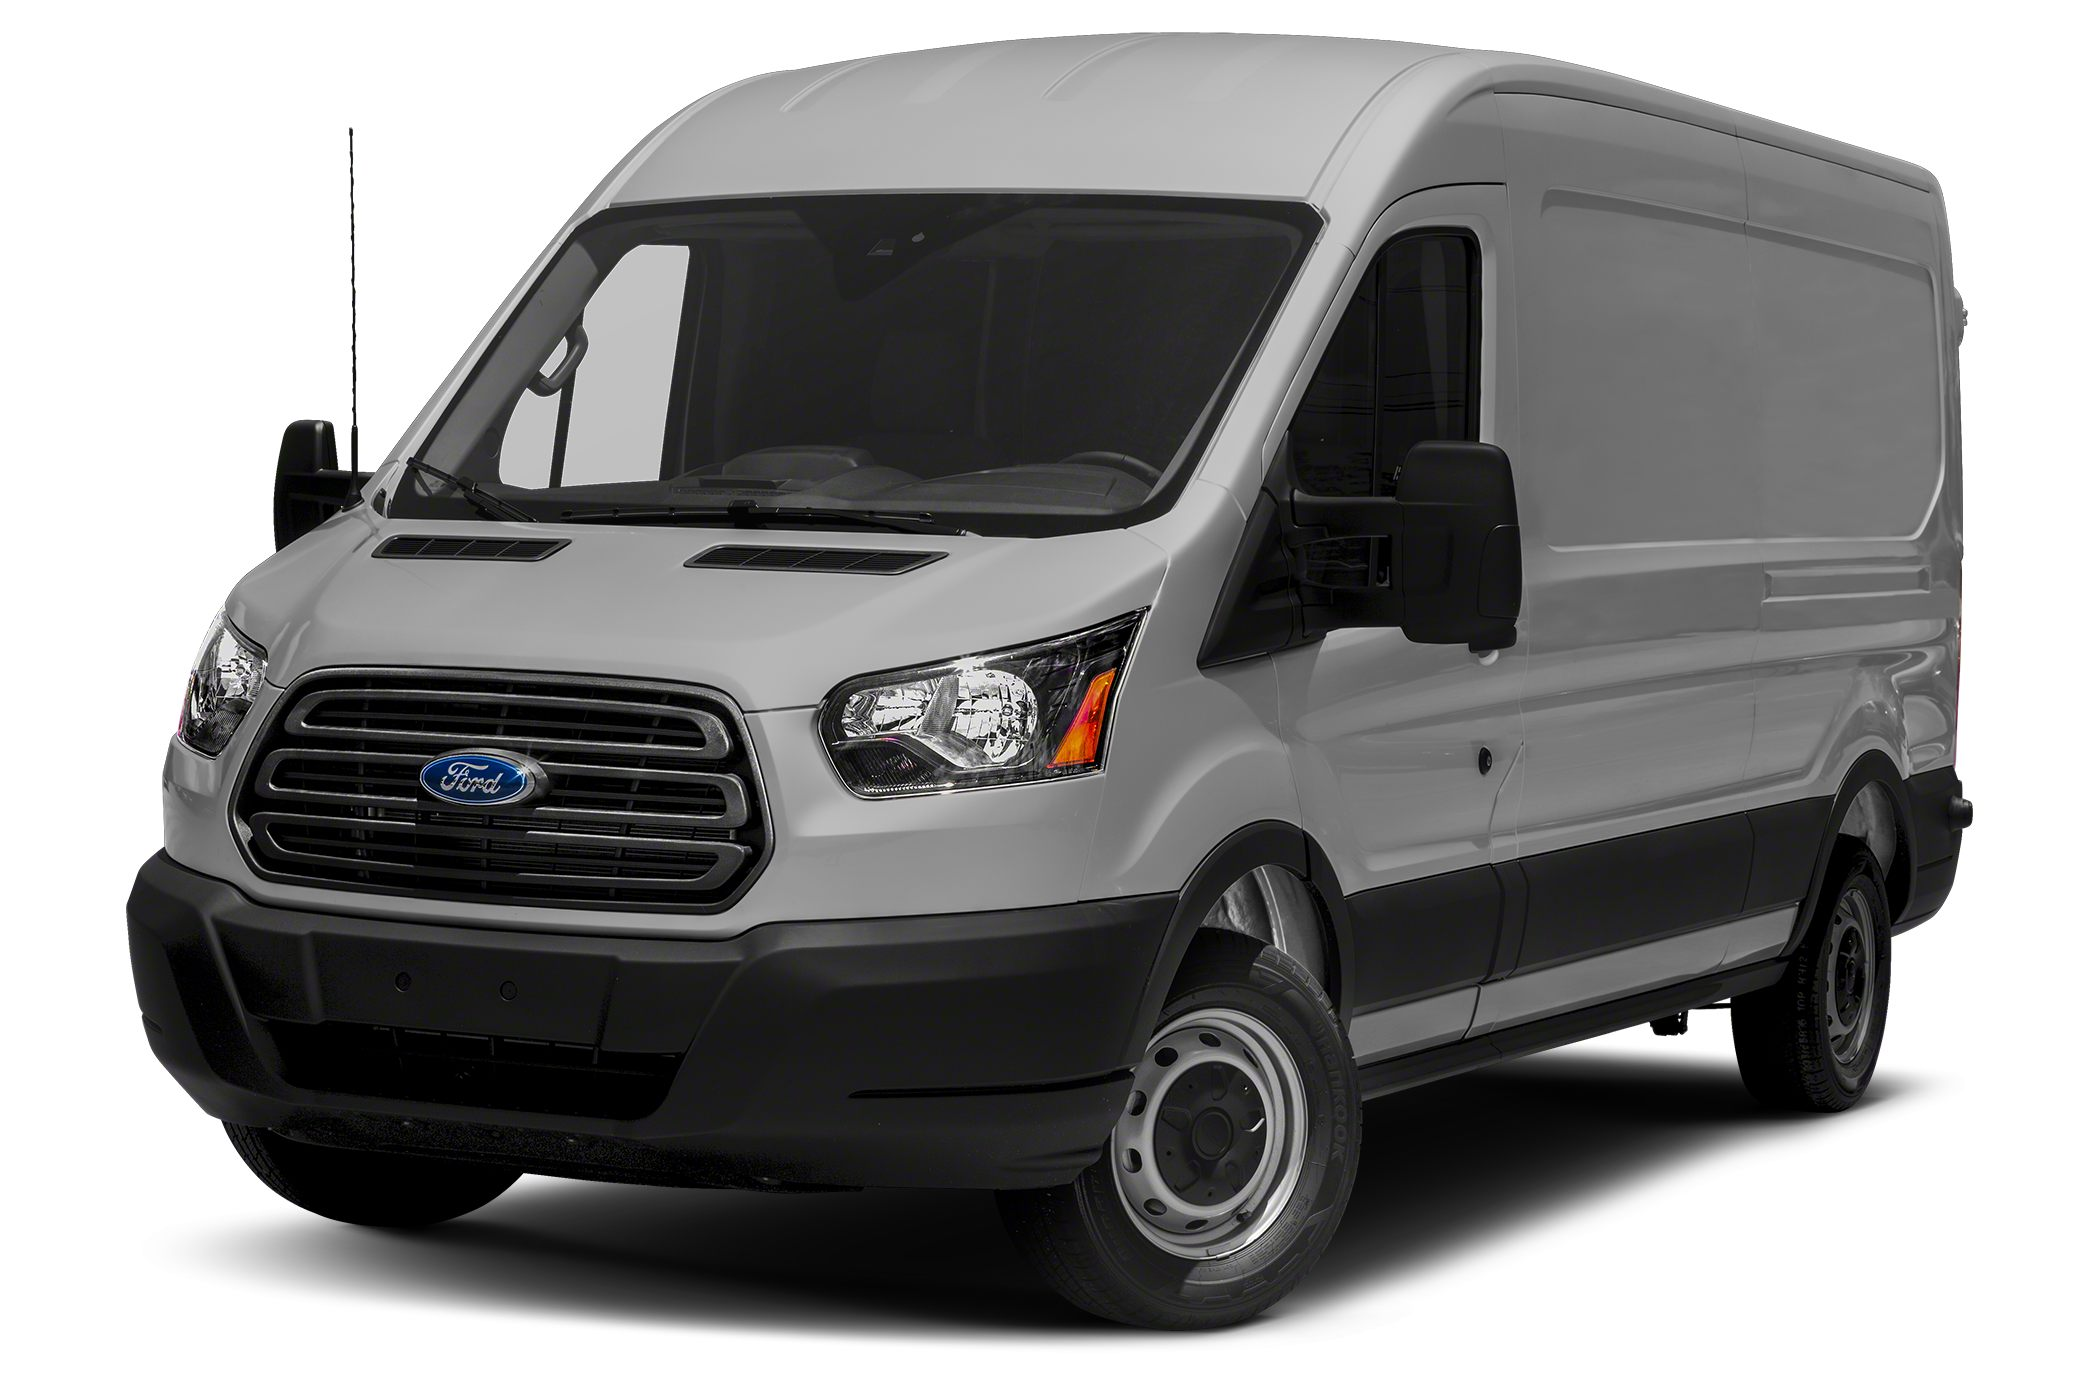 2017 Ford Transit 150 Cargo Van >> 2017 Ford Transit 150 Base W Sliding Pass Side Cargo Door Medium Roof Cargo Van 147 6 In Wb Pictures